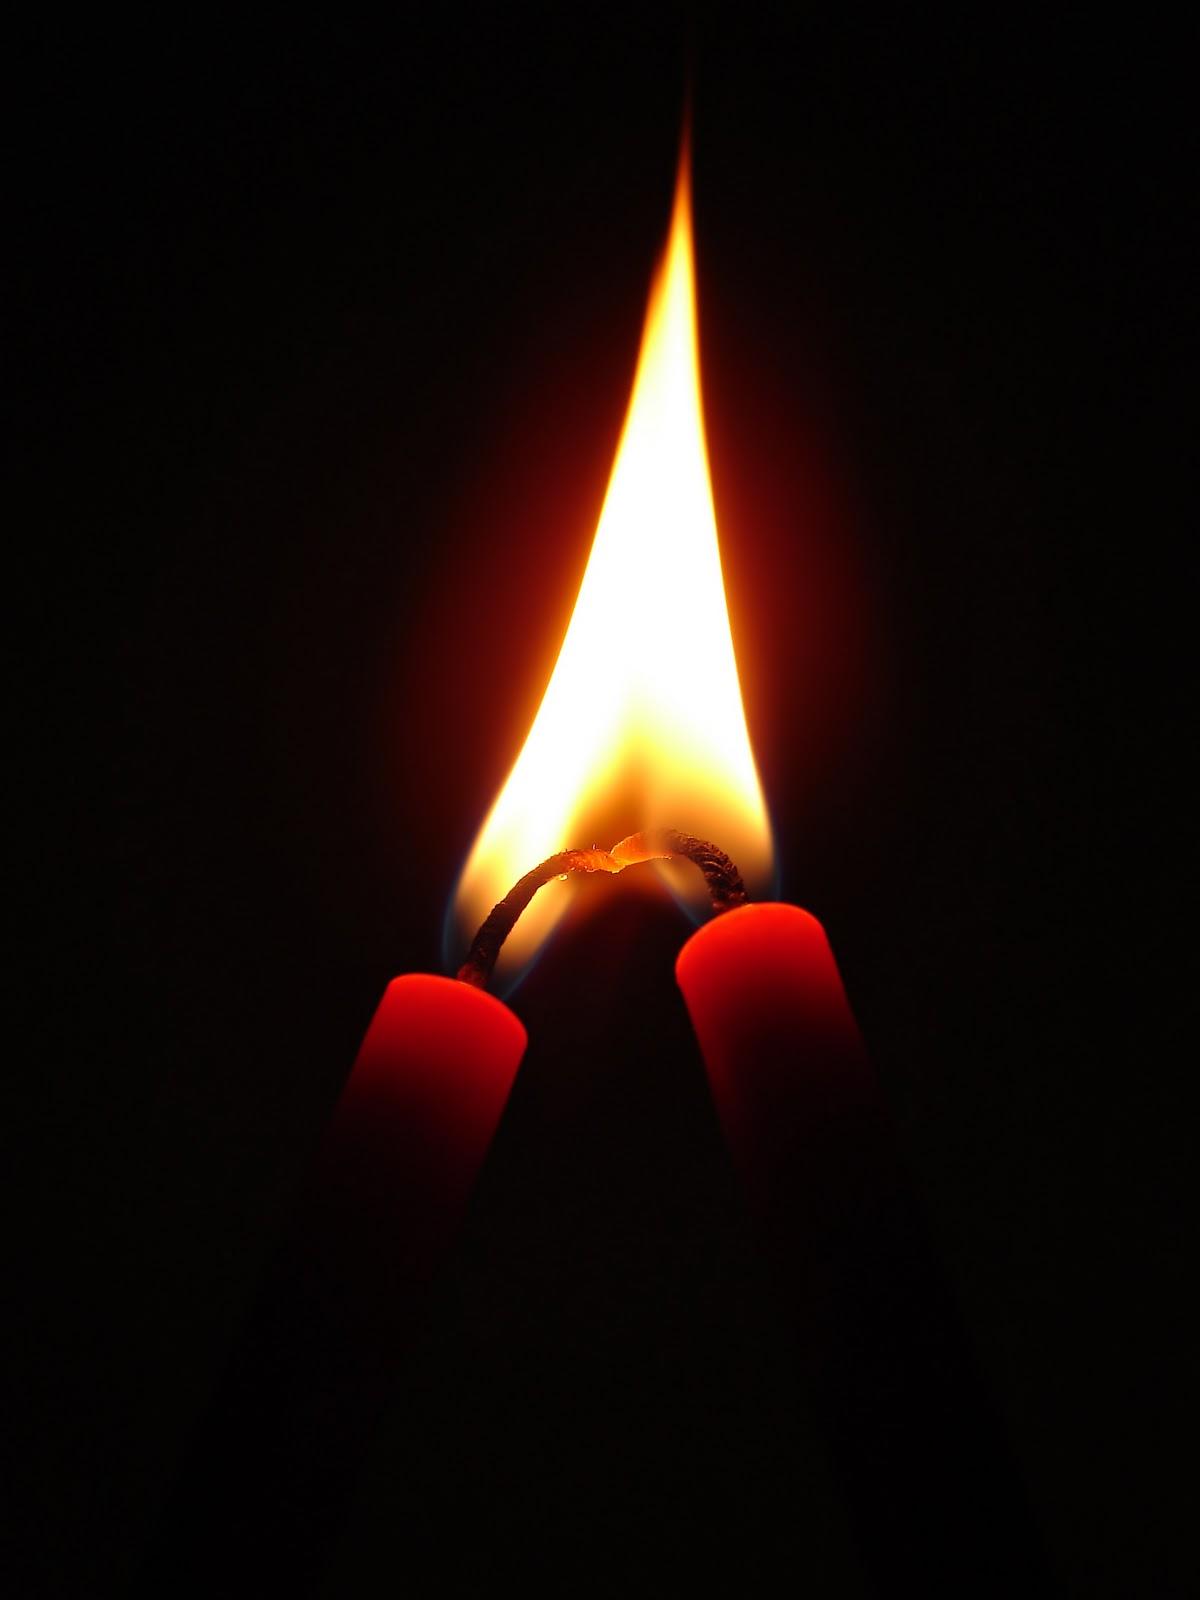 http://4.bp.blogspot.com/-vz5zxmG5X3U/TyJ30OaqRVI/AAAAAAAACK4/-zYEbONqDro/s1600/Candles_in_Love_07406.jpg